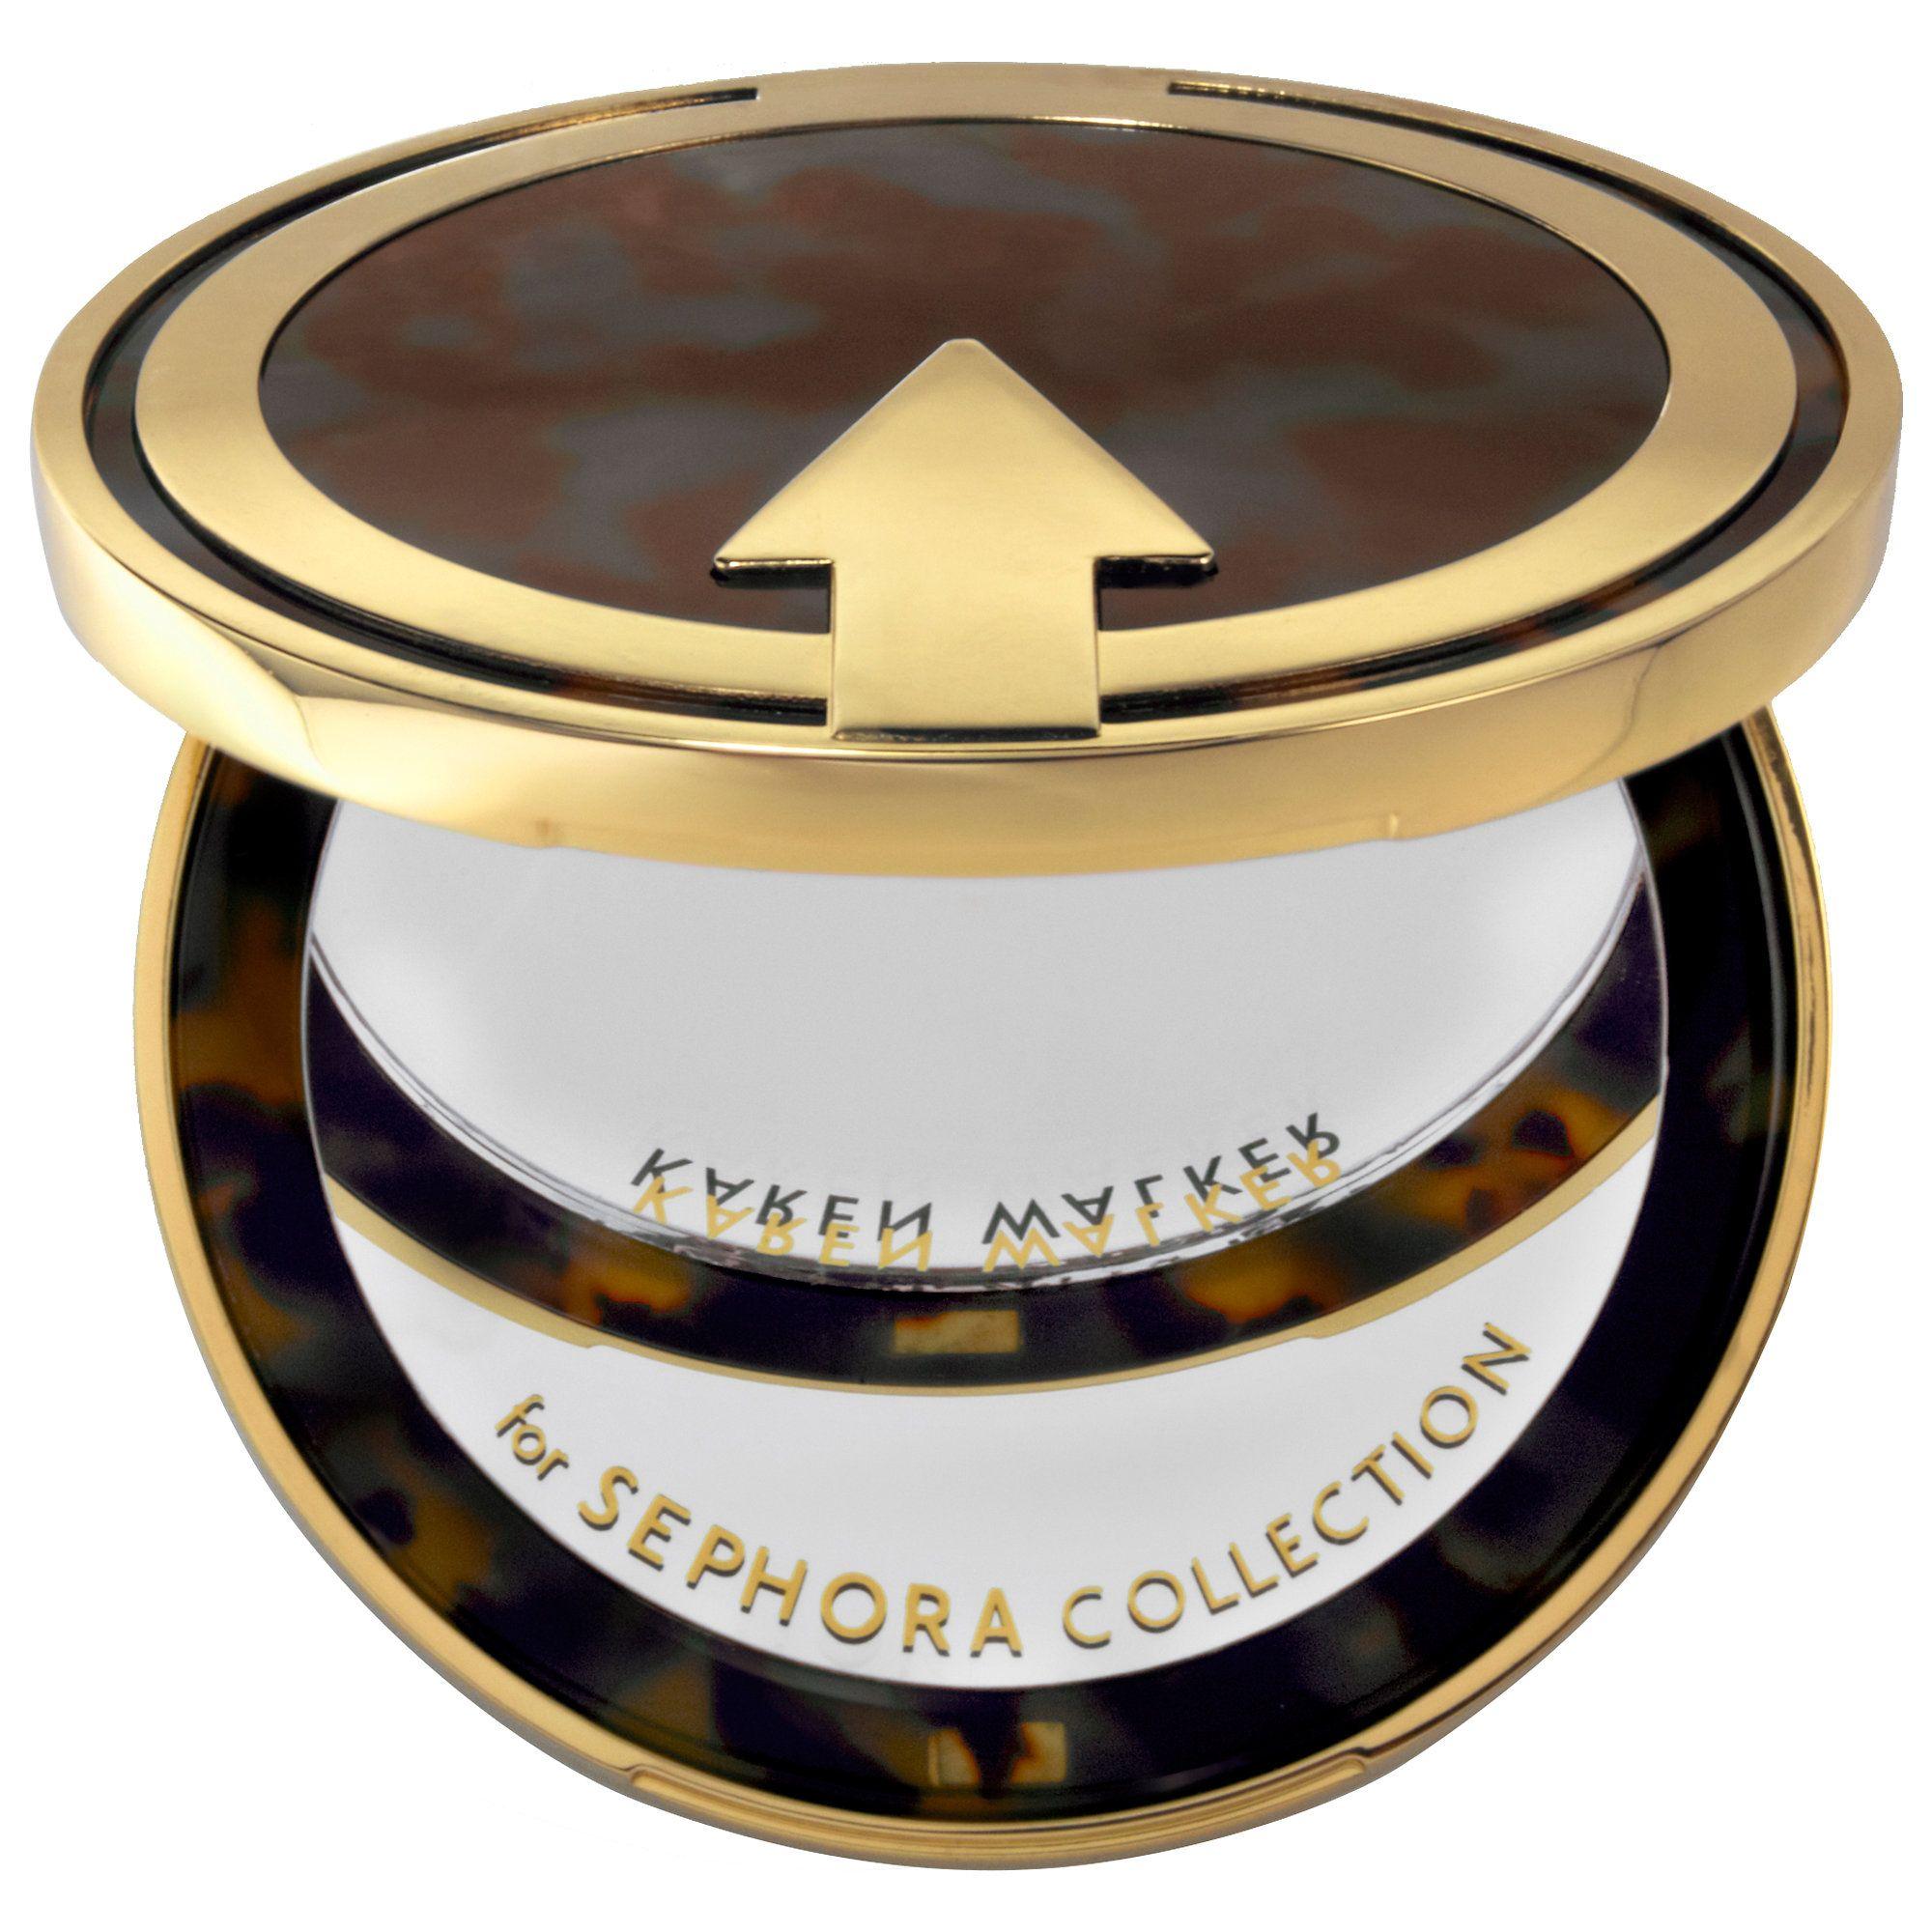 Shop Sephora Collection's KAREN WALKER Amber Craft Mirror